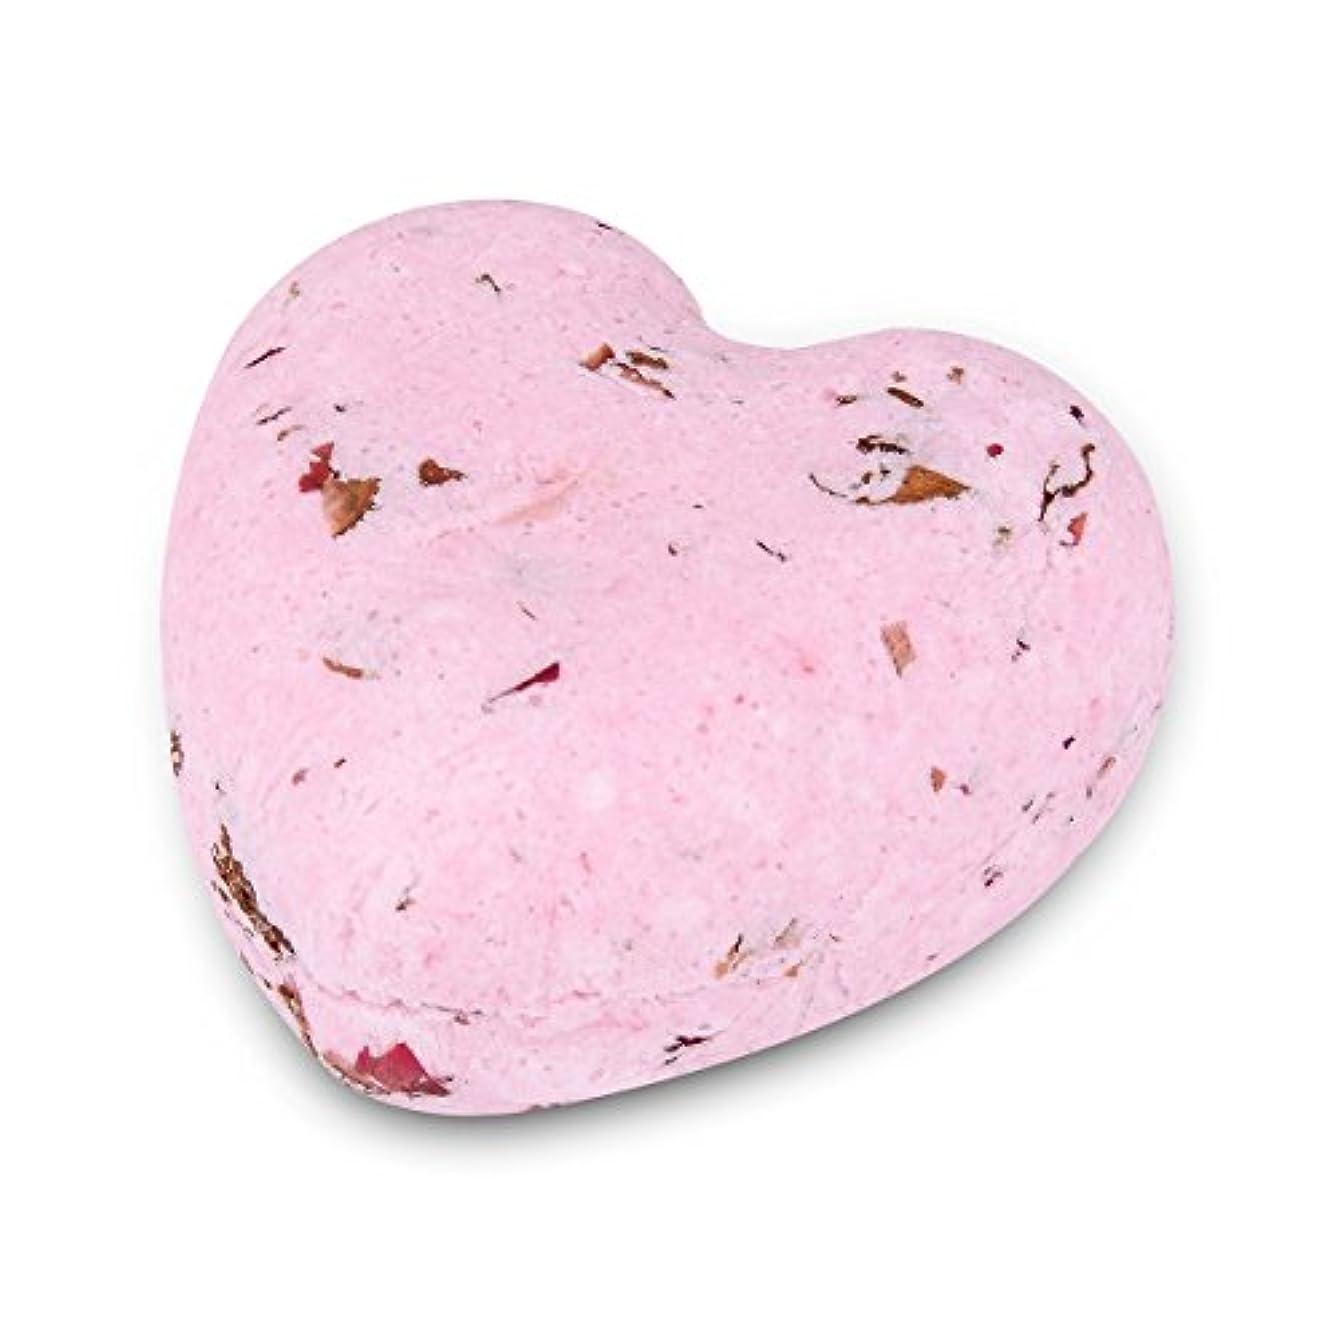 HOUSWEETY ローズの香り ハート型 バスボム 炭酸入浴剤 入浴料 海塩 アロマオイル バスボール 1個入り